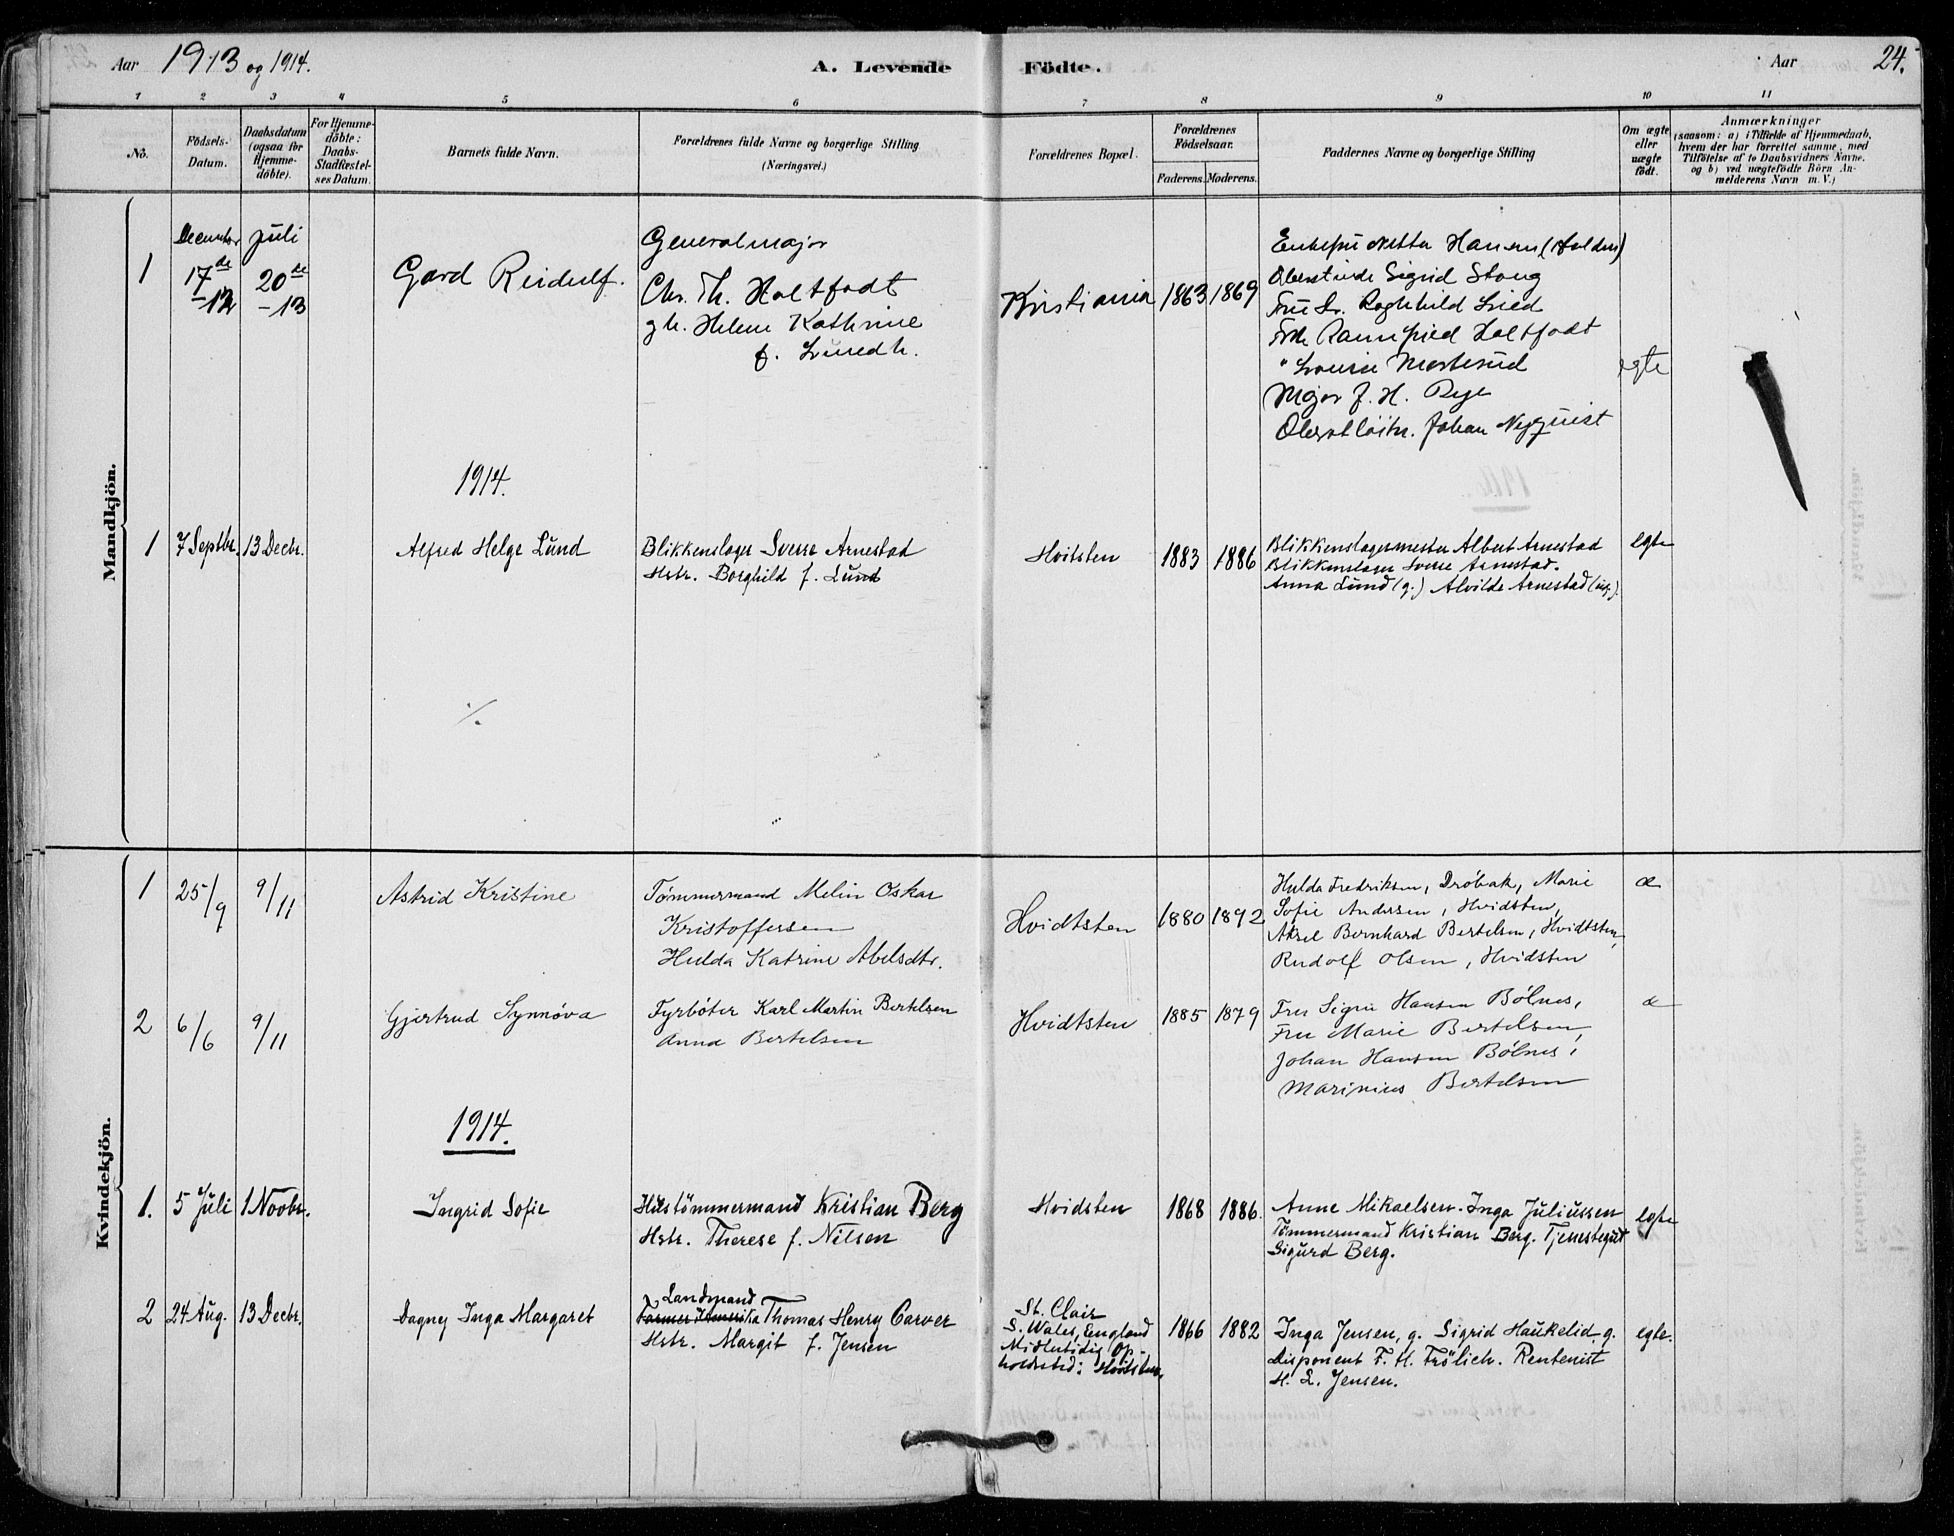 SAO, Vestby prestekontor Kirkebøker, F/Fd/L0001: Ministerialbok nr. IV 1, 1878-1945, s. 24